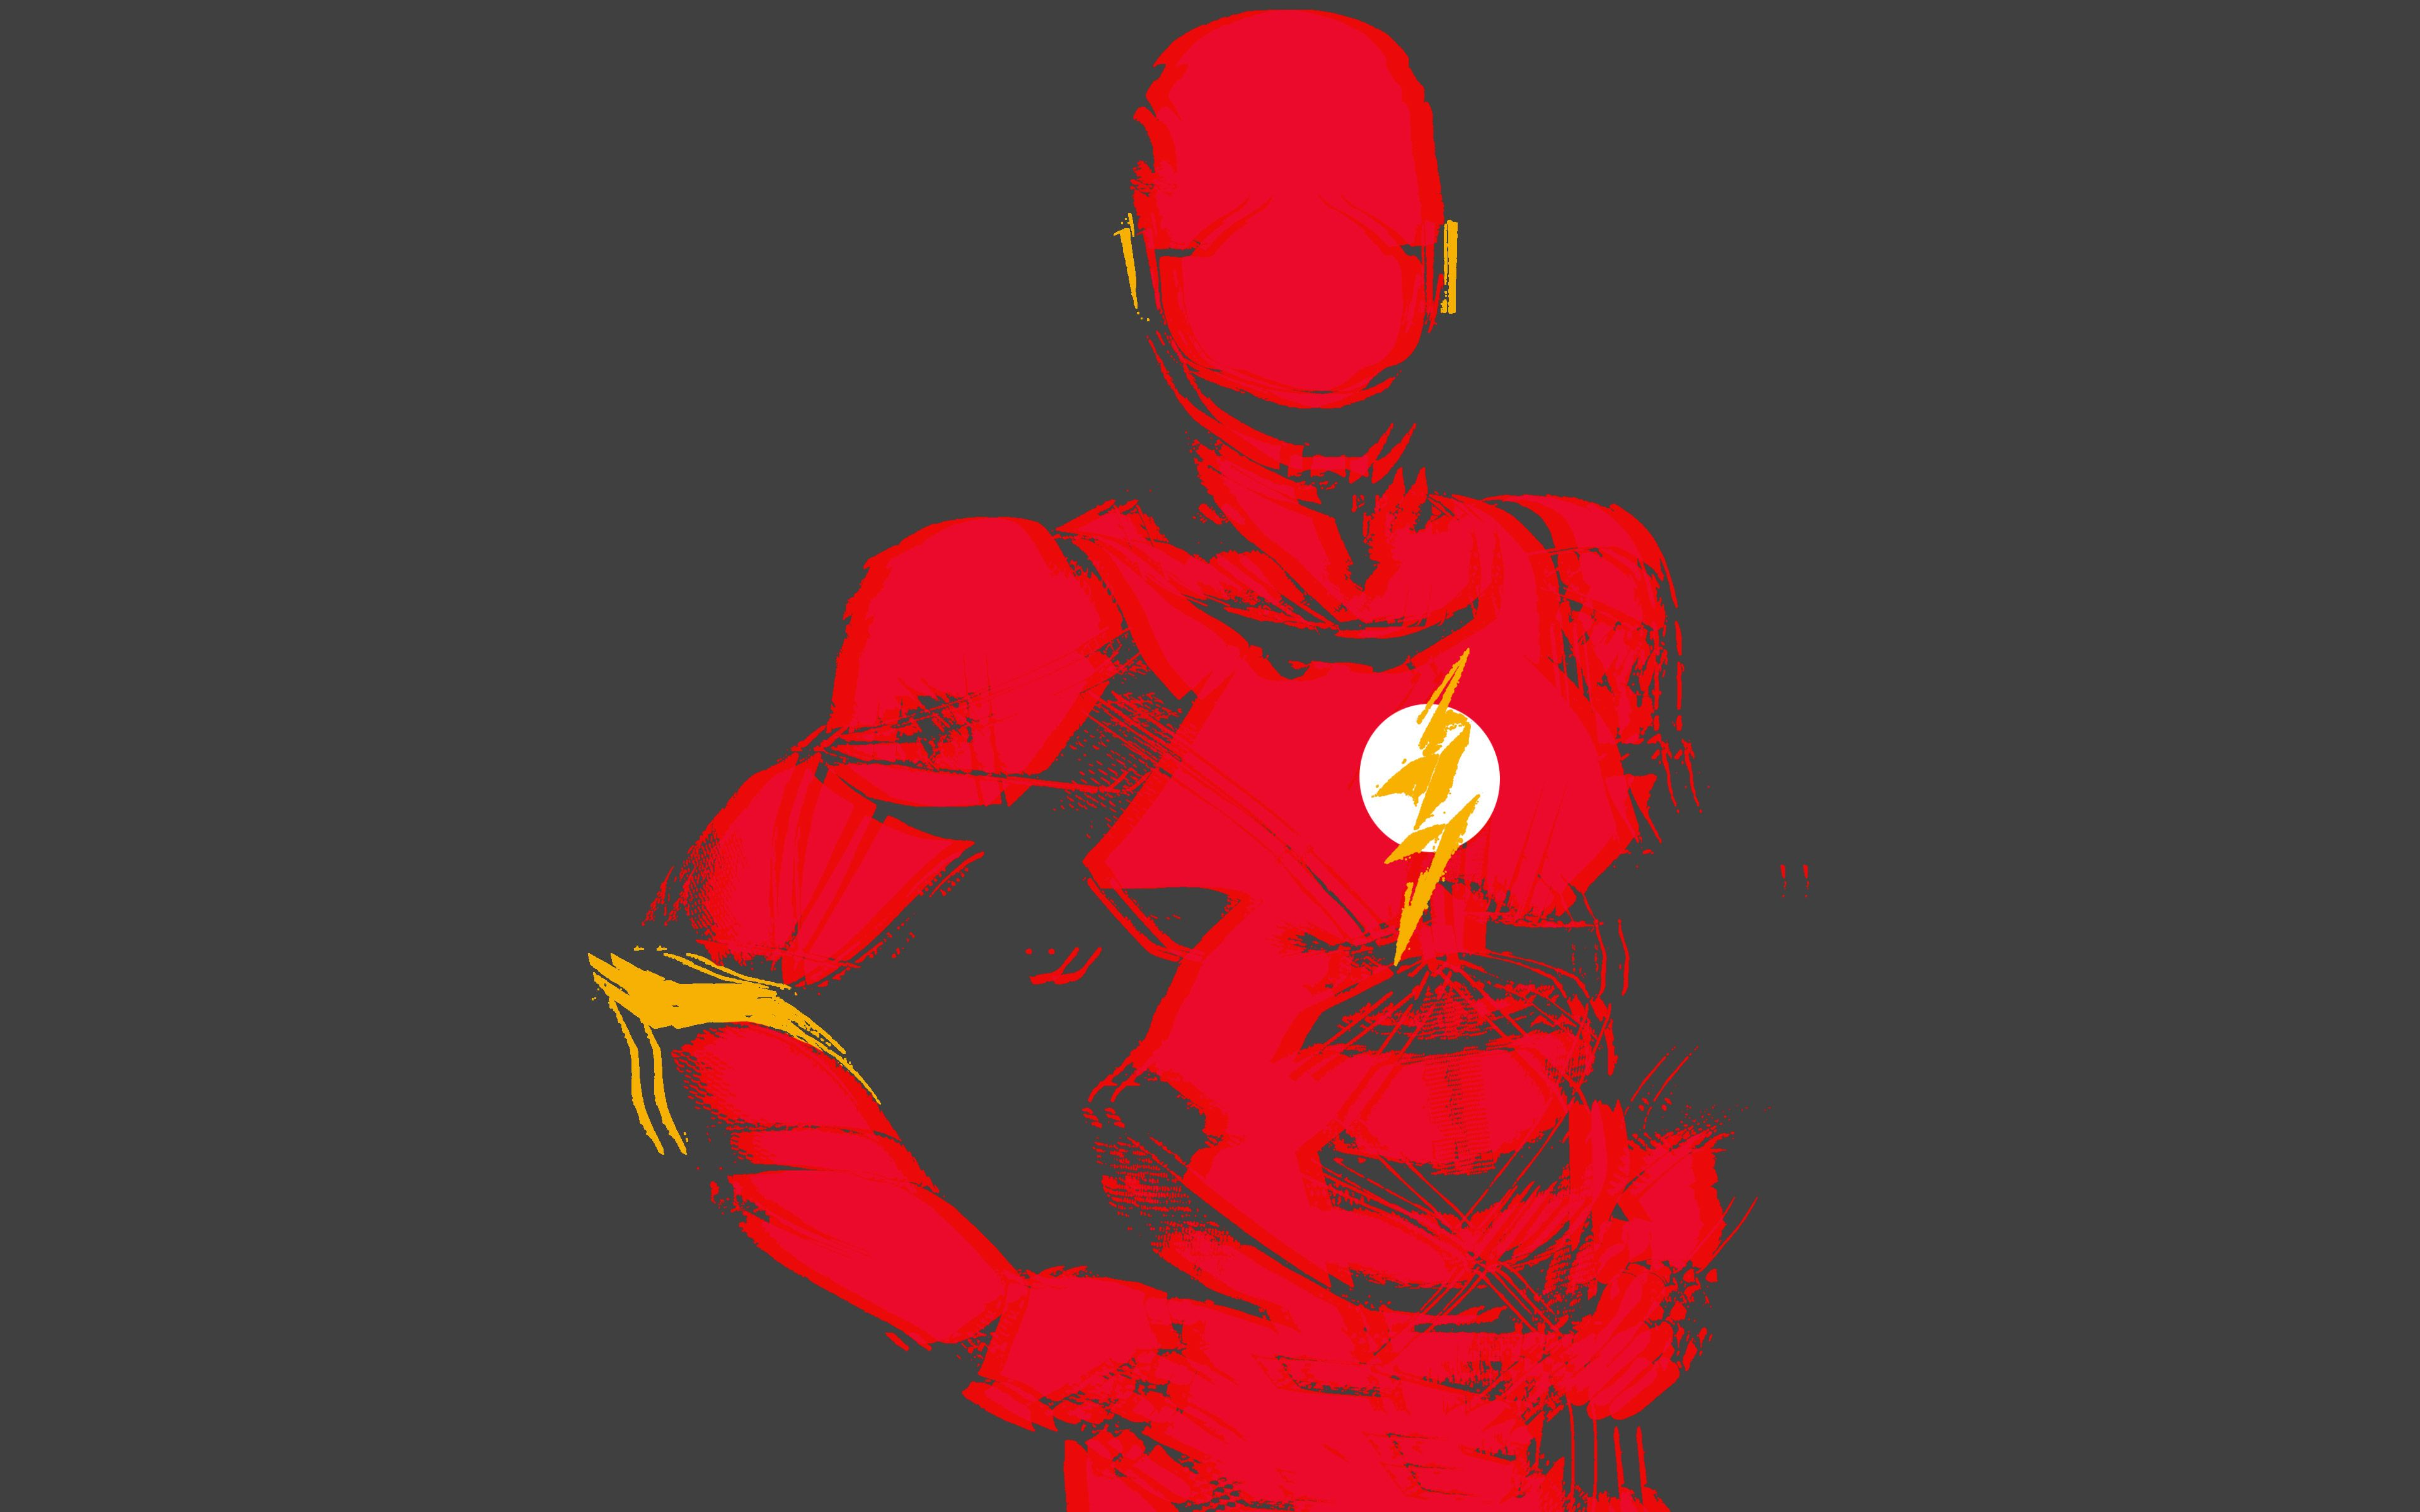 The Flash Logo 4k Wallpapers Top Free The Flash Logo 4k